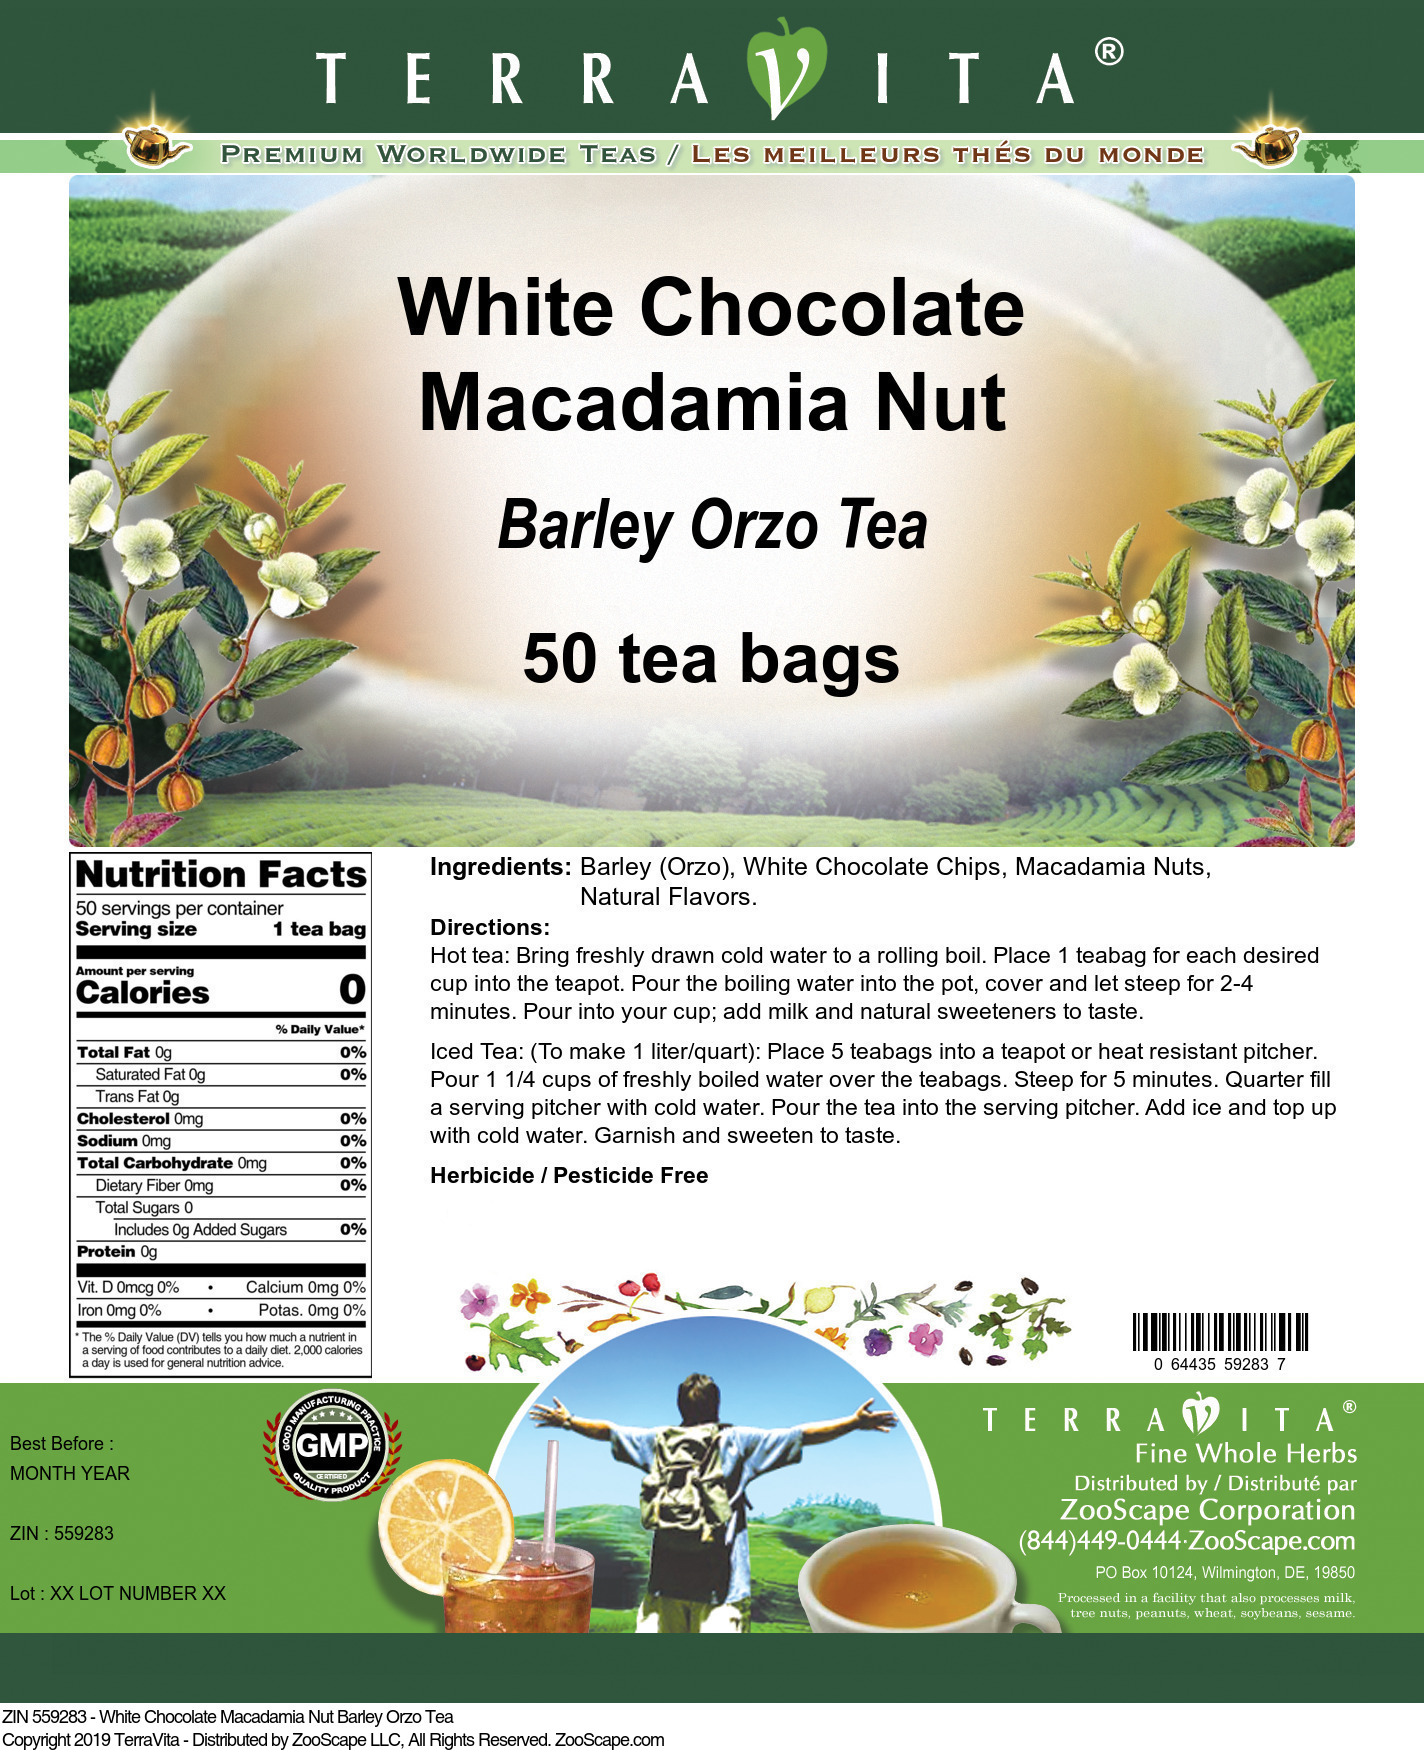 White Chocolate Macadamia Nut Barley Orzo